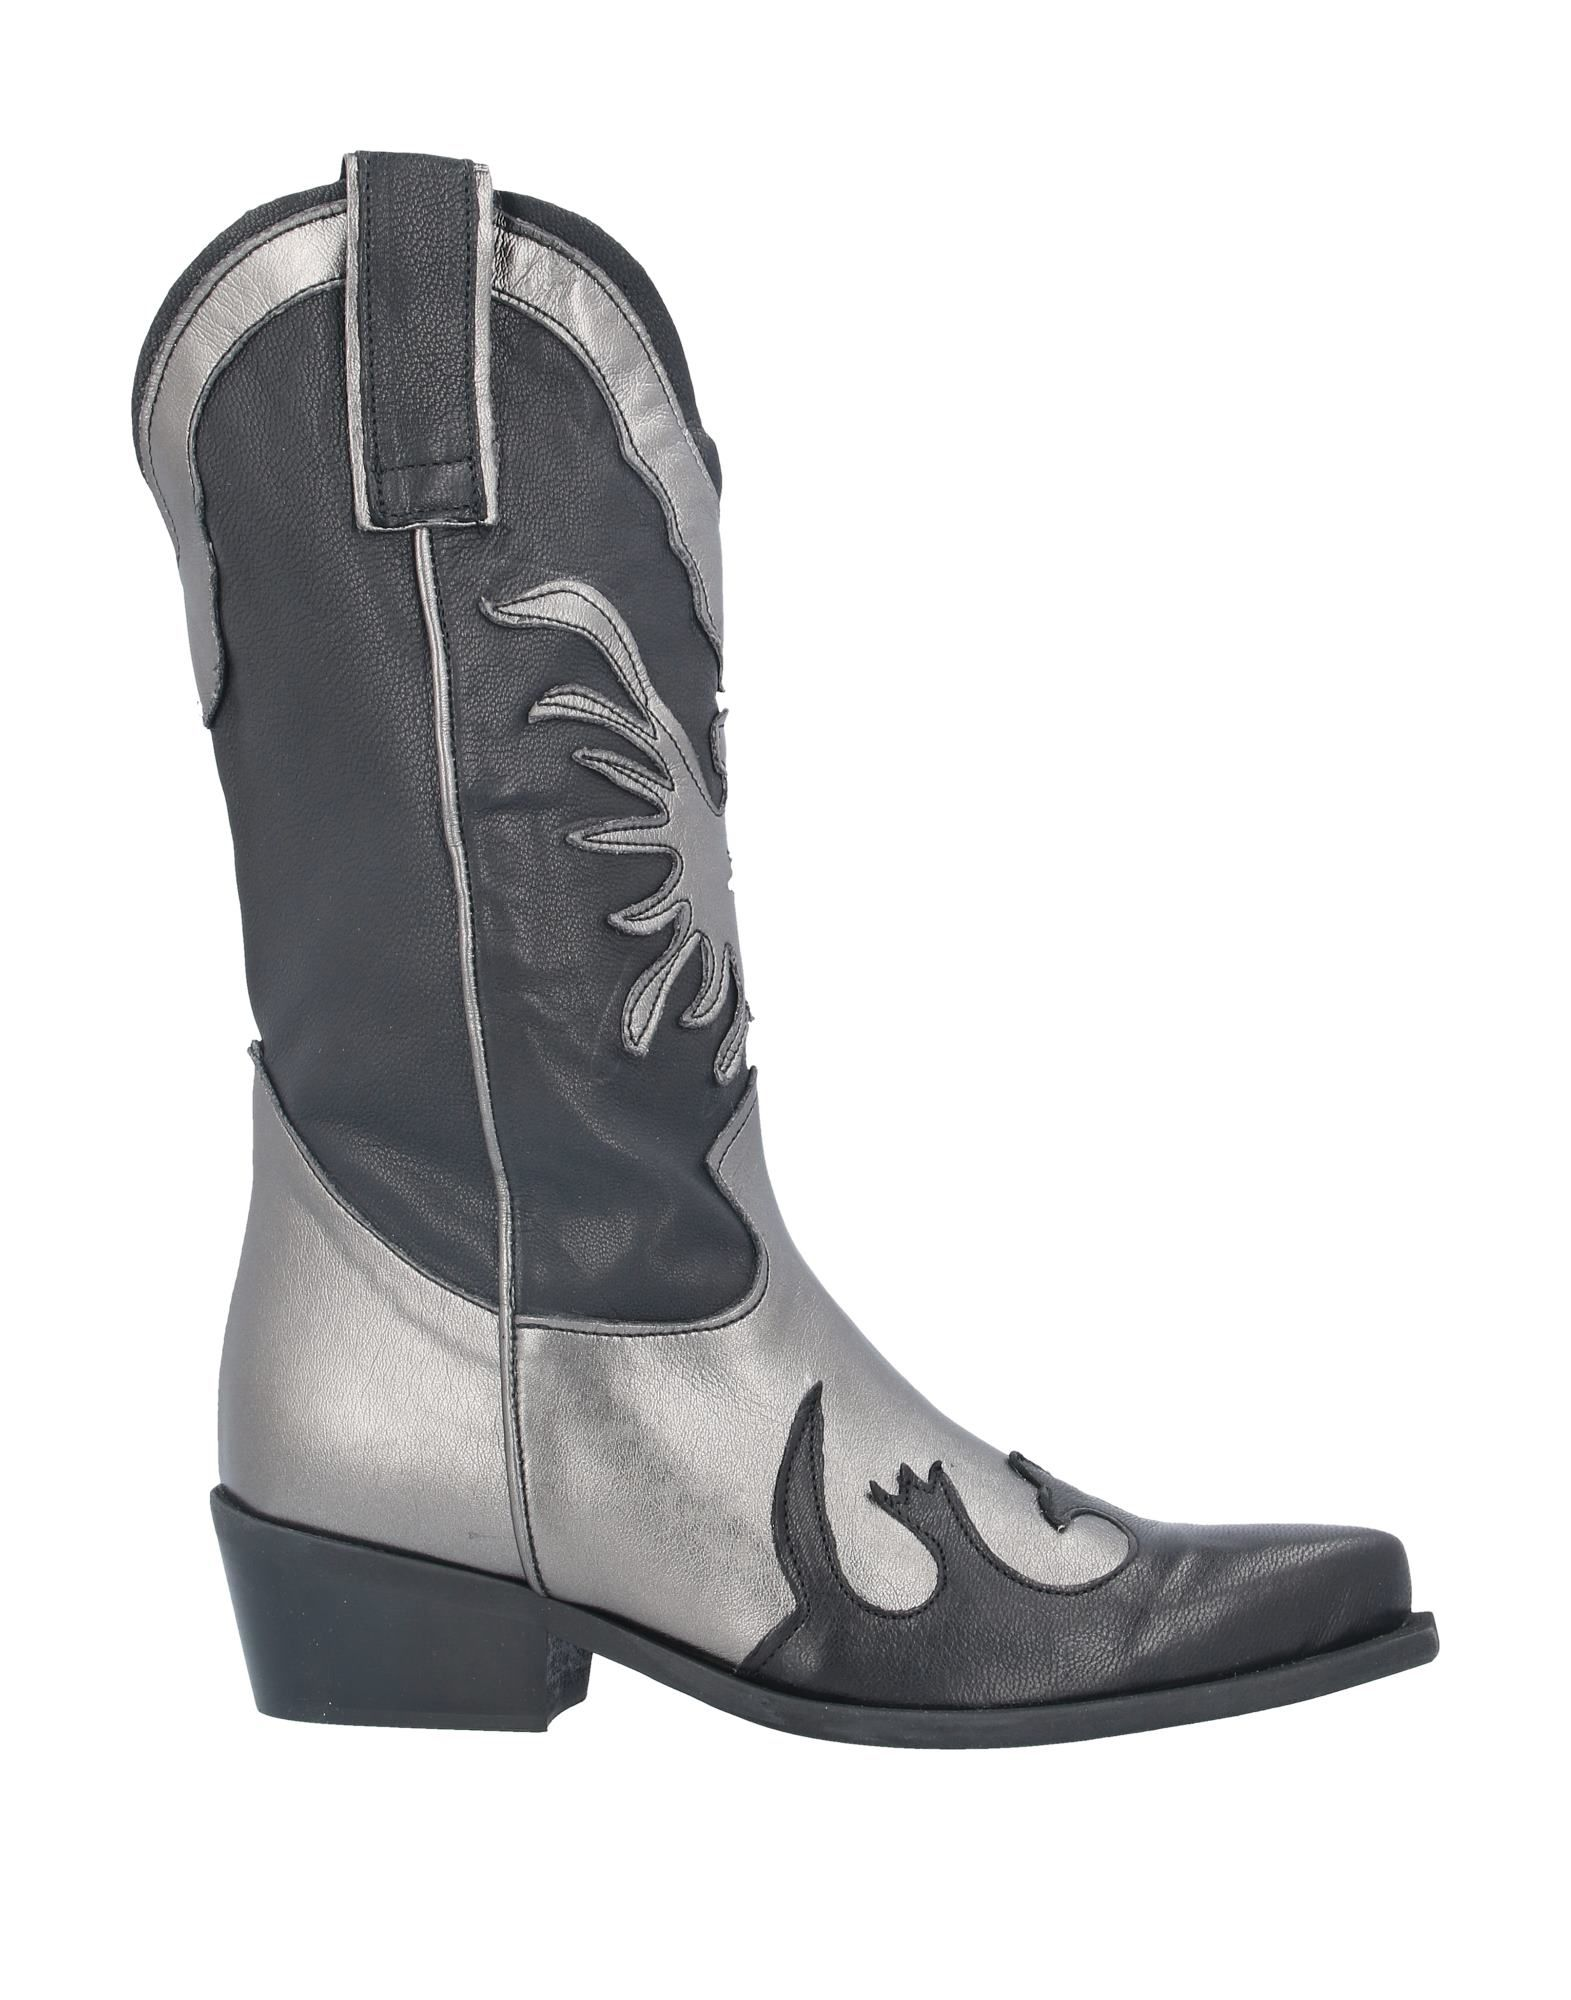 NILA & NILA Сапоги ankle boots nila nila ботильоны на шнуровке